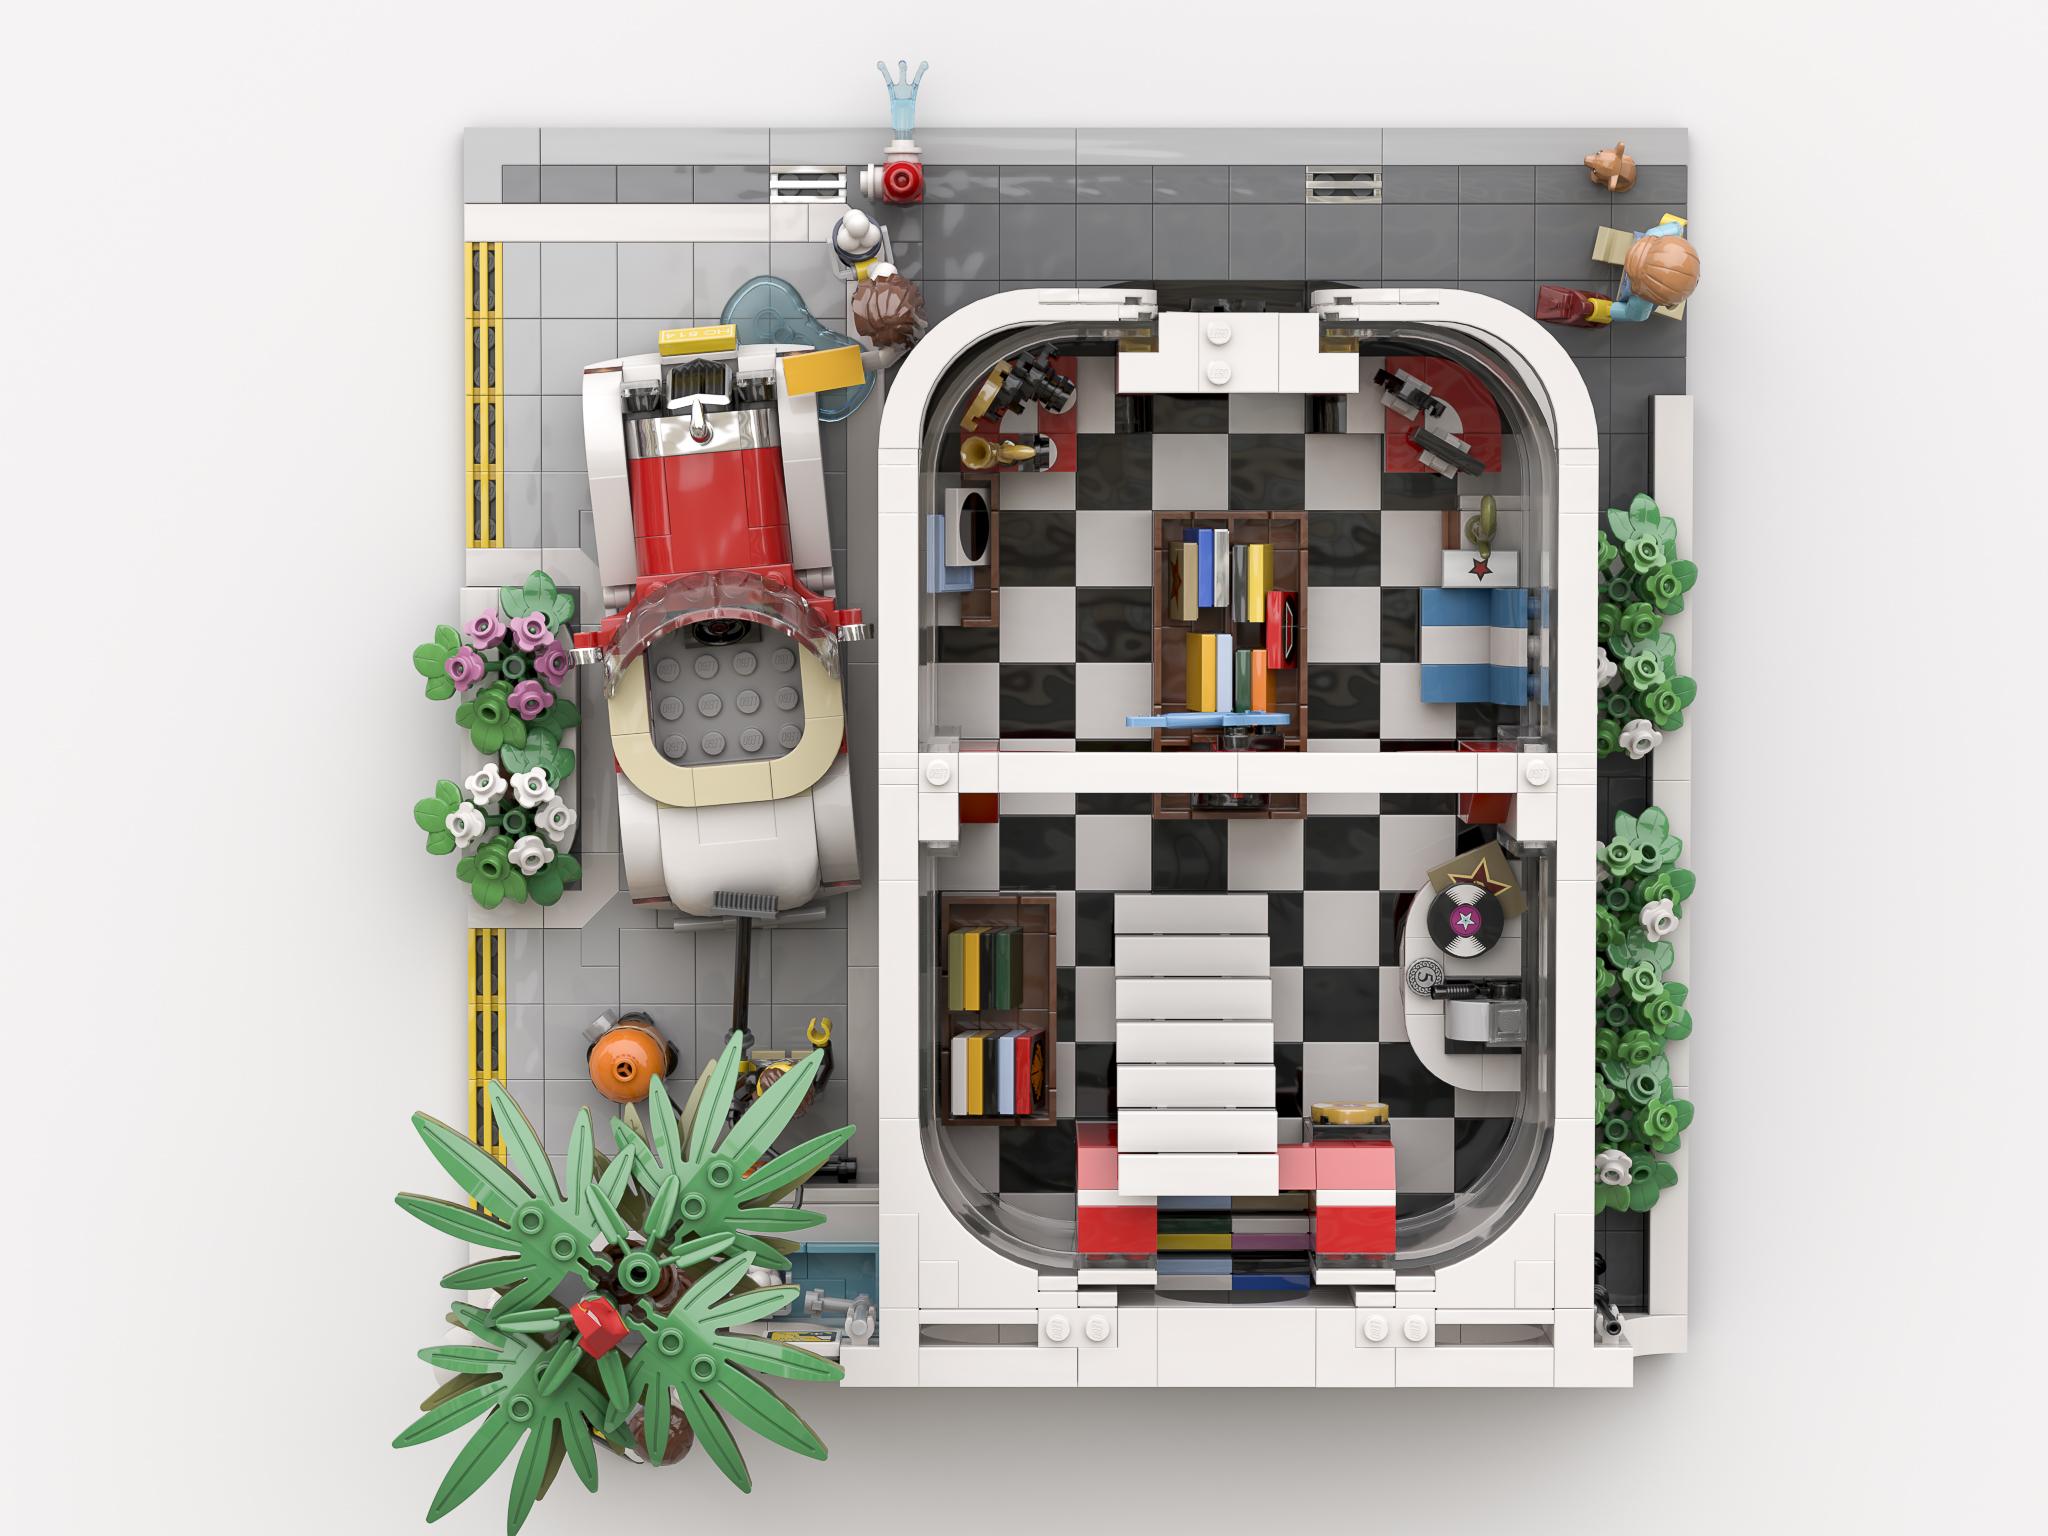 lego-ideas-the-car-wash-e-gitarre-music-store-innenleben-bricky-brick zusammengebaut.com